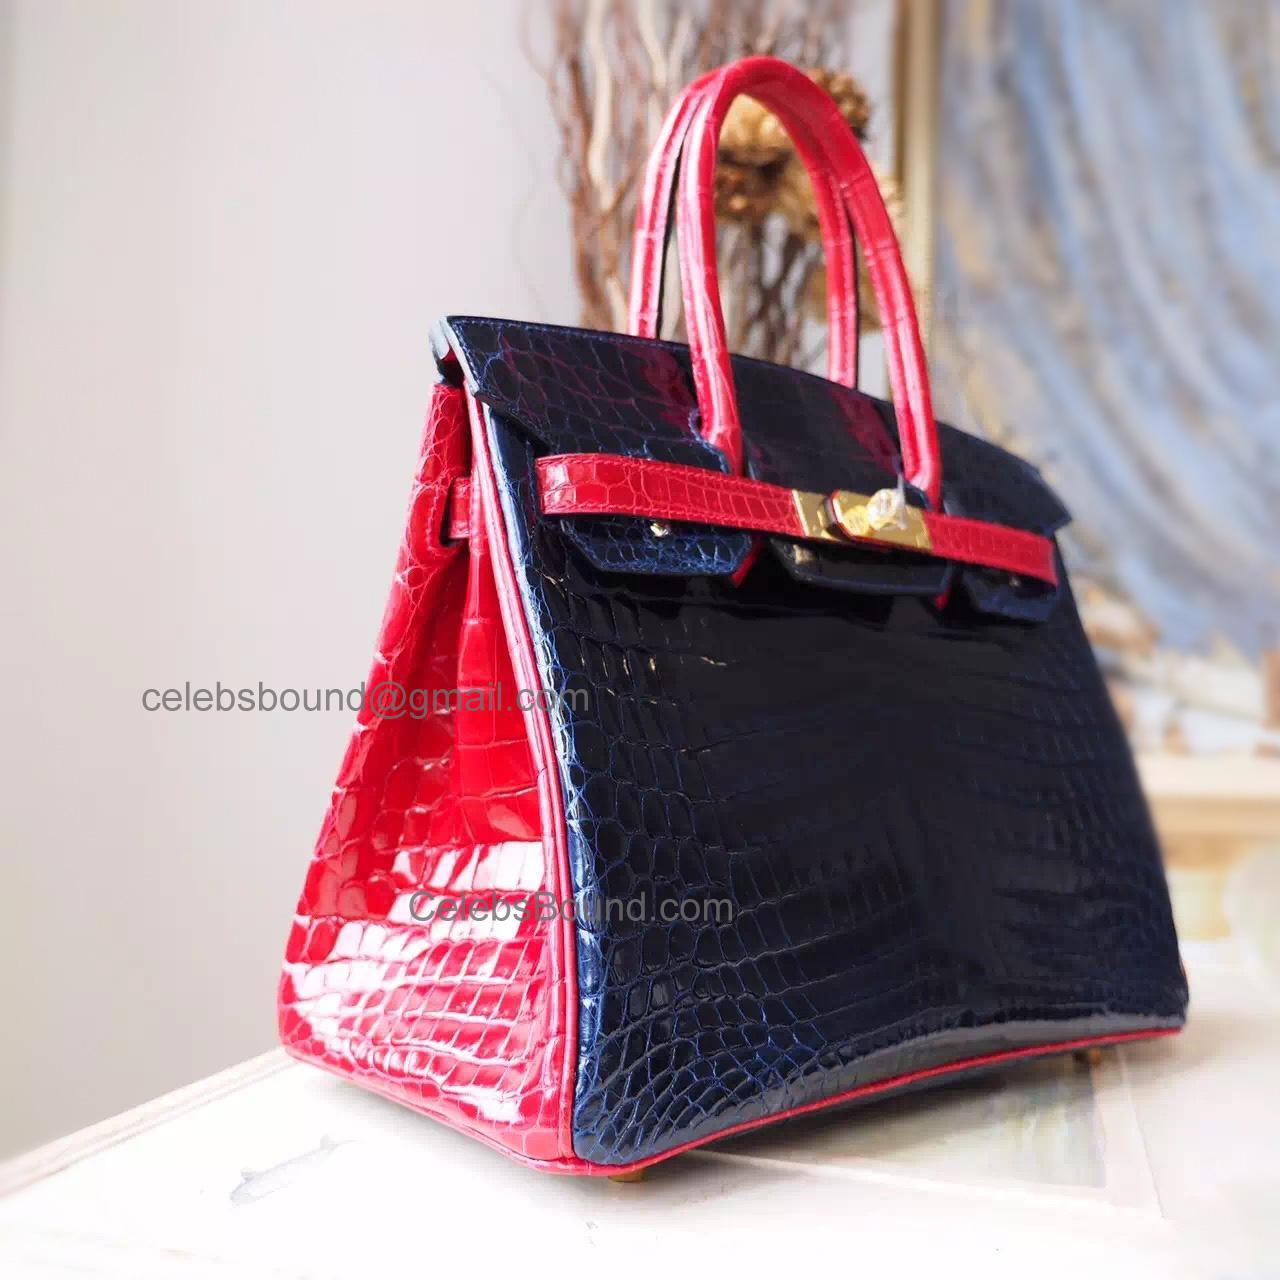 8dd627578458 Hand Stitched Hermes Birkin 30 Bag in Bicolored ck76 Blue Indigo Shining  Niloticus Croc GHW -